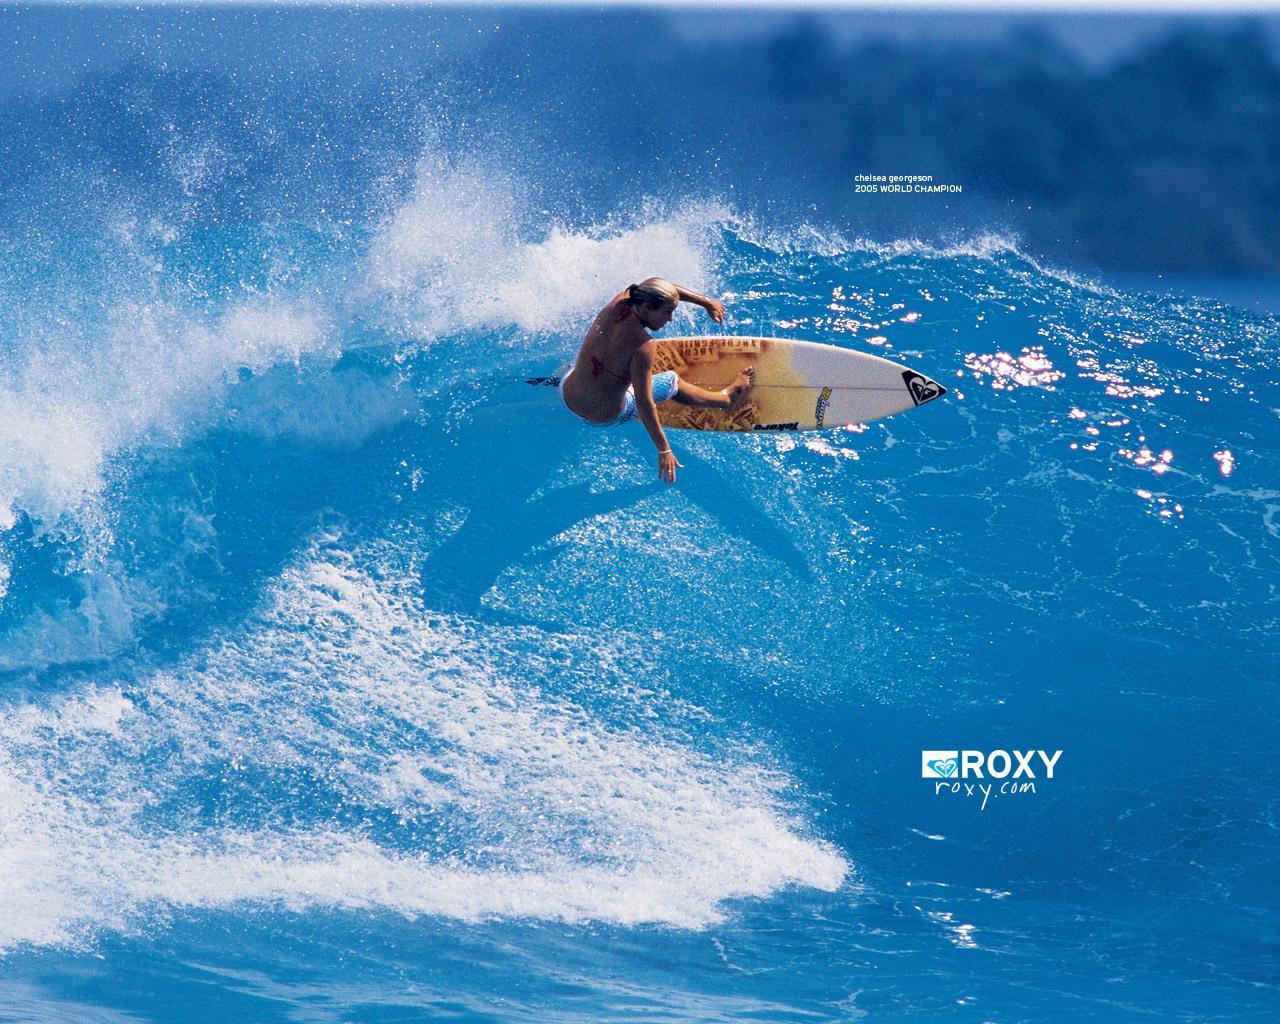 winter surfing roxy wallpaper - photo #15